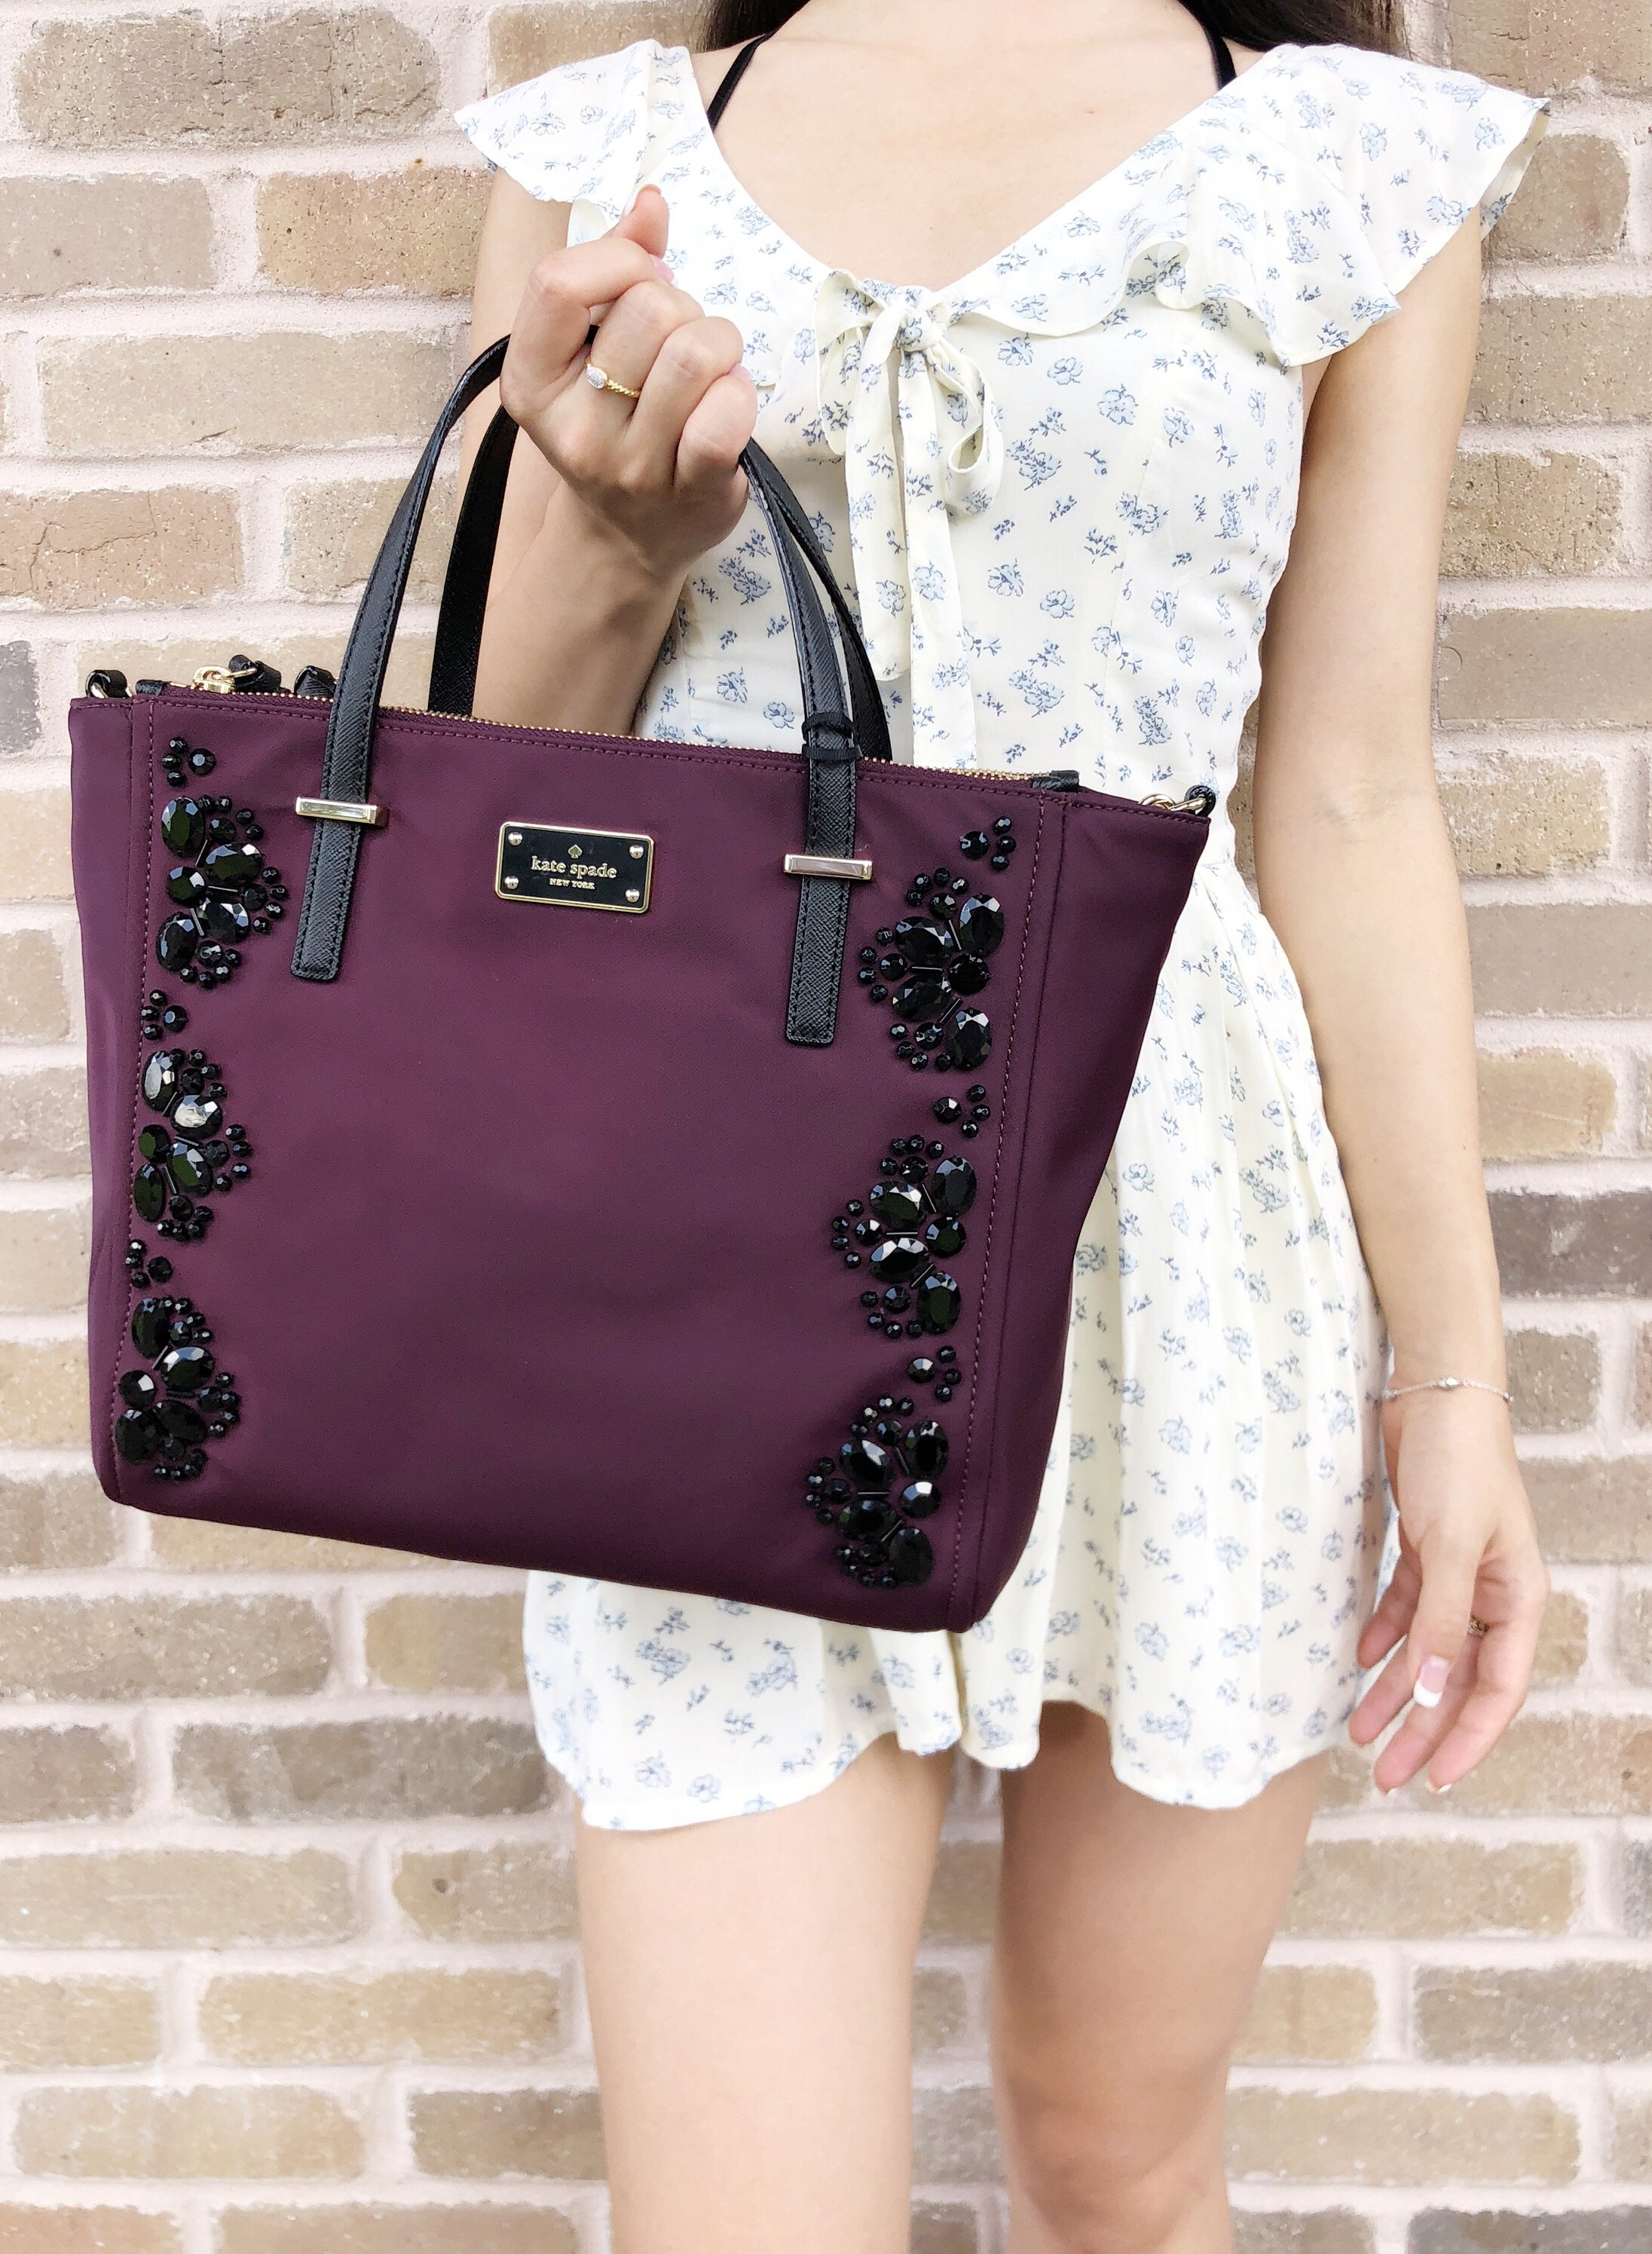 a60ada8abc1b Kate Spade Wilson Road Embellished Alyse Satchel Tote Deep Plum Black Stone  #Handbags #GabysBags